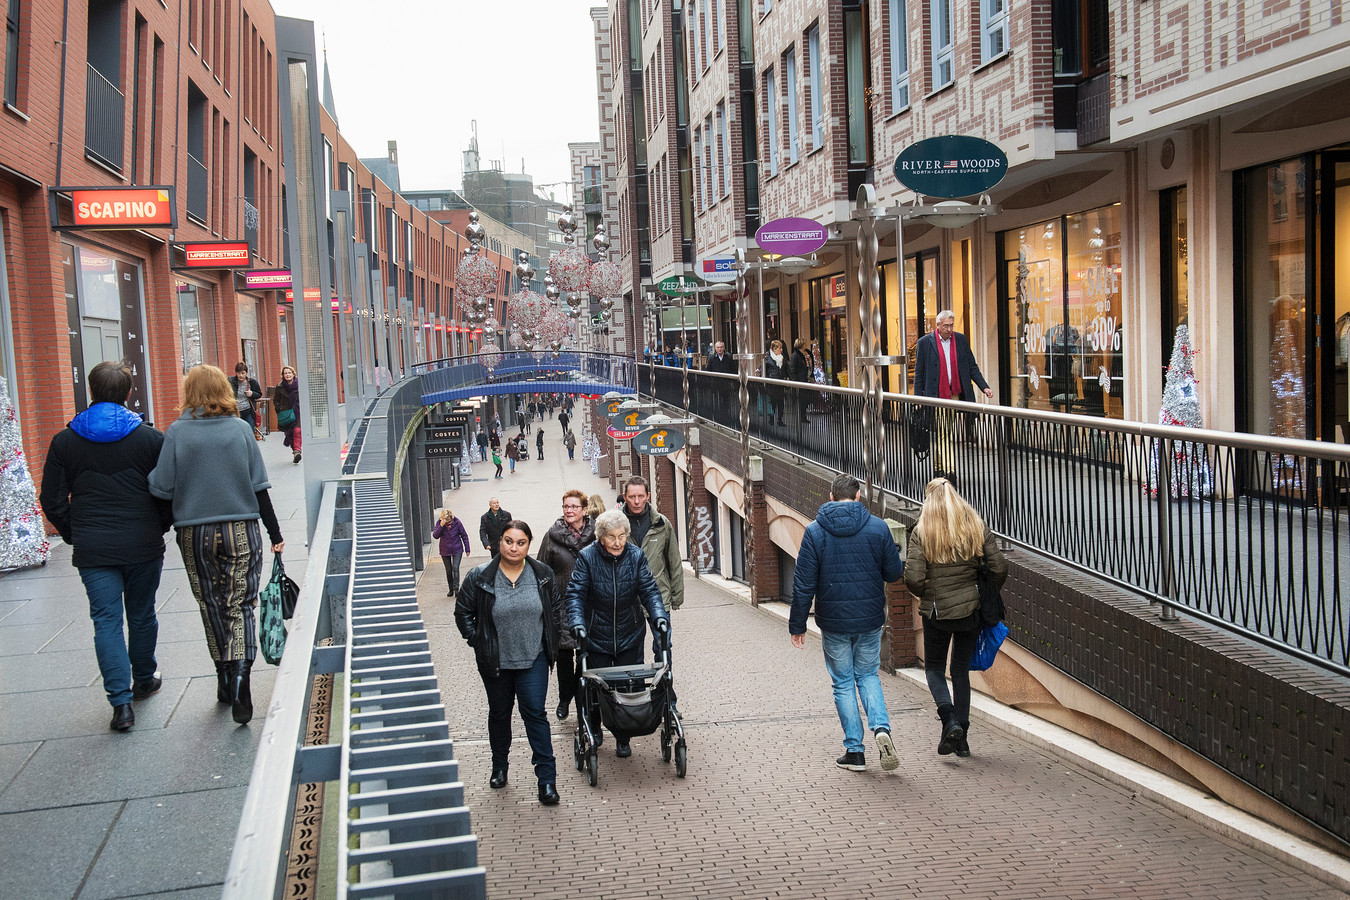 7fa6d6b274d Winkelserie: Sfeervol shoppen in de koopgoot van Nijmegen ...